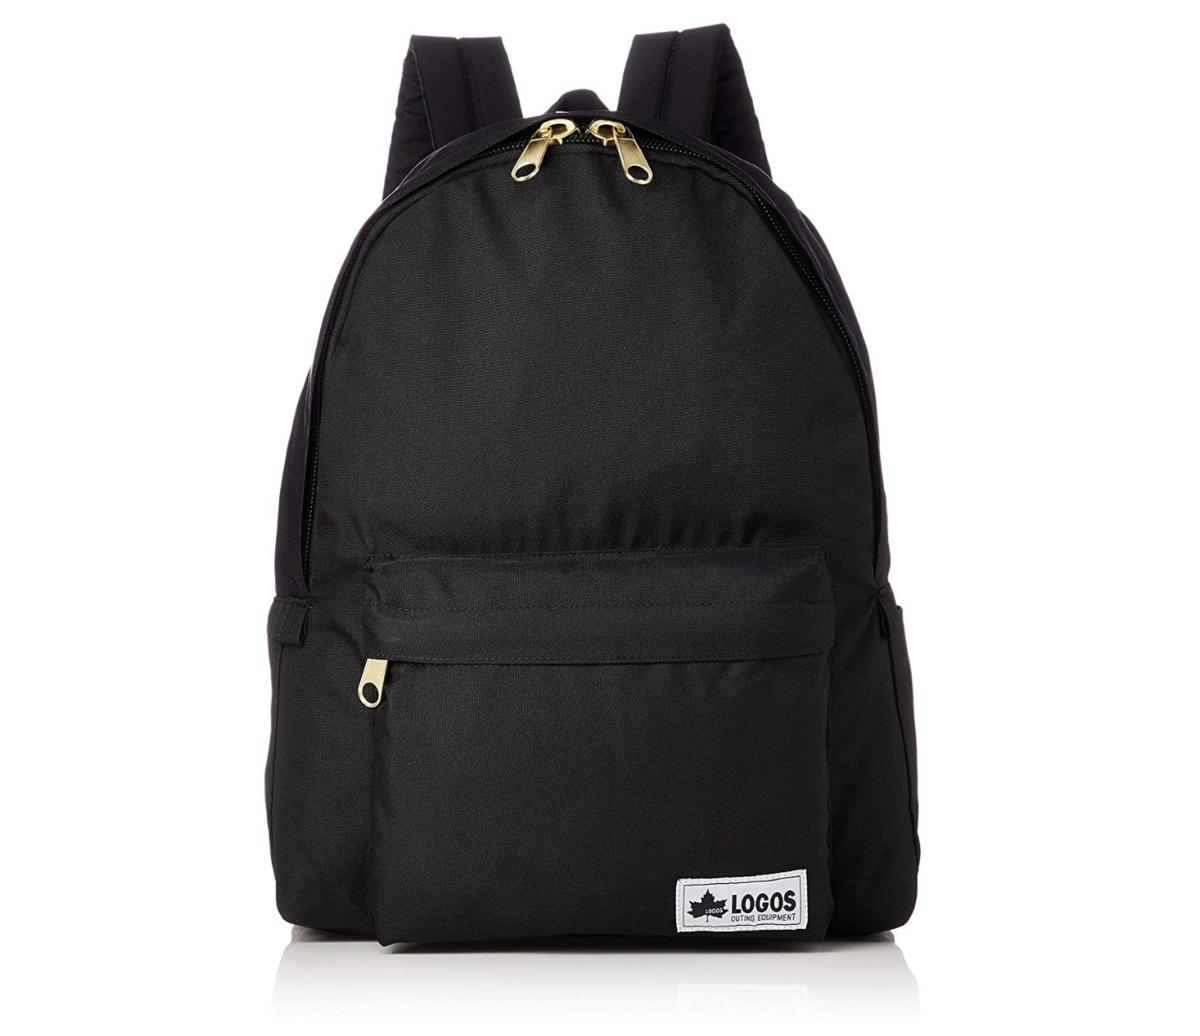 f:id:thebackpack:20190317102357p:plain